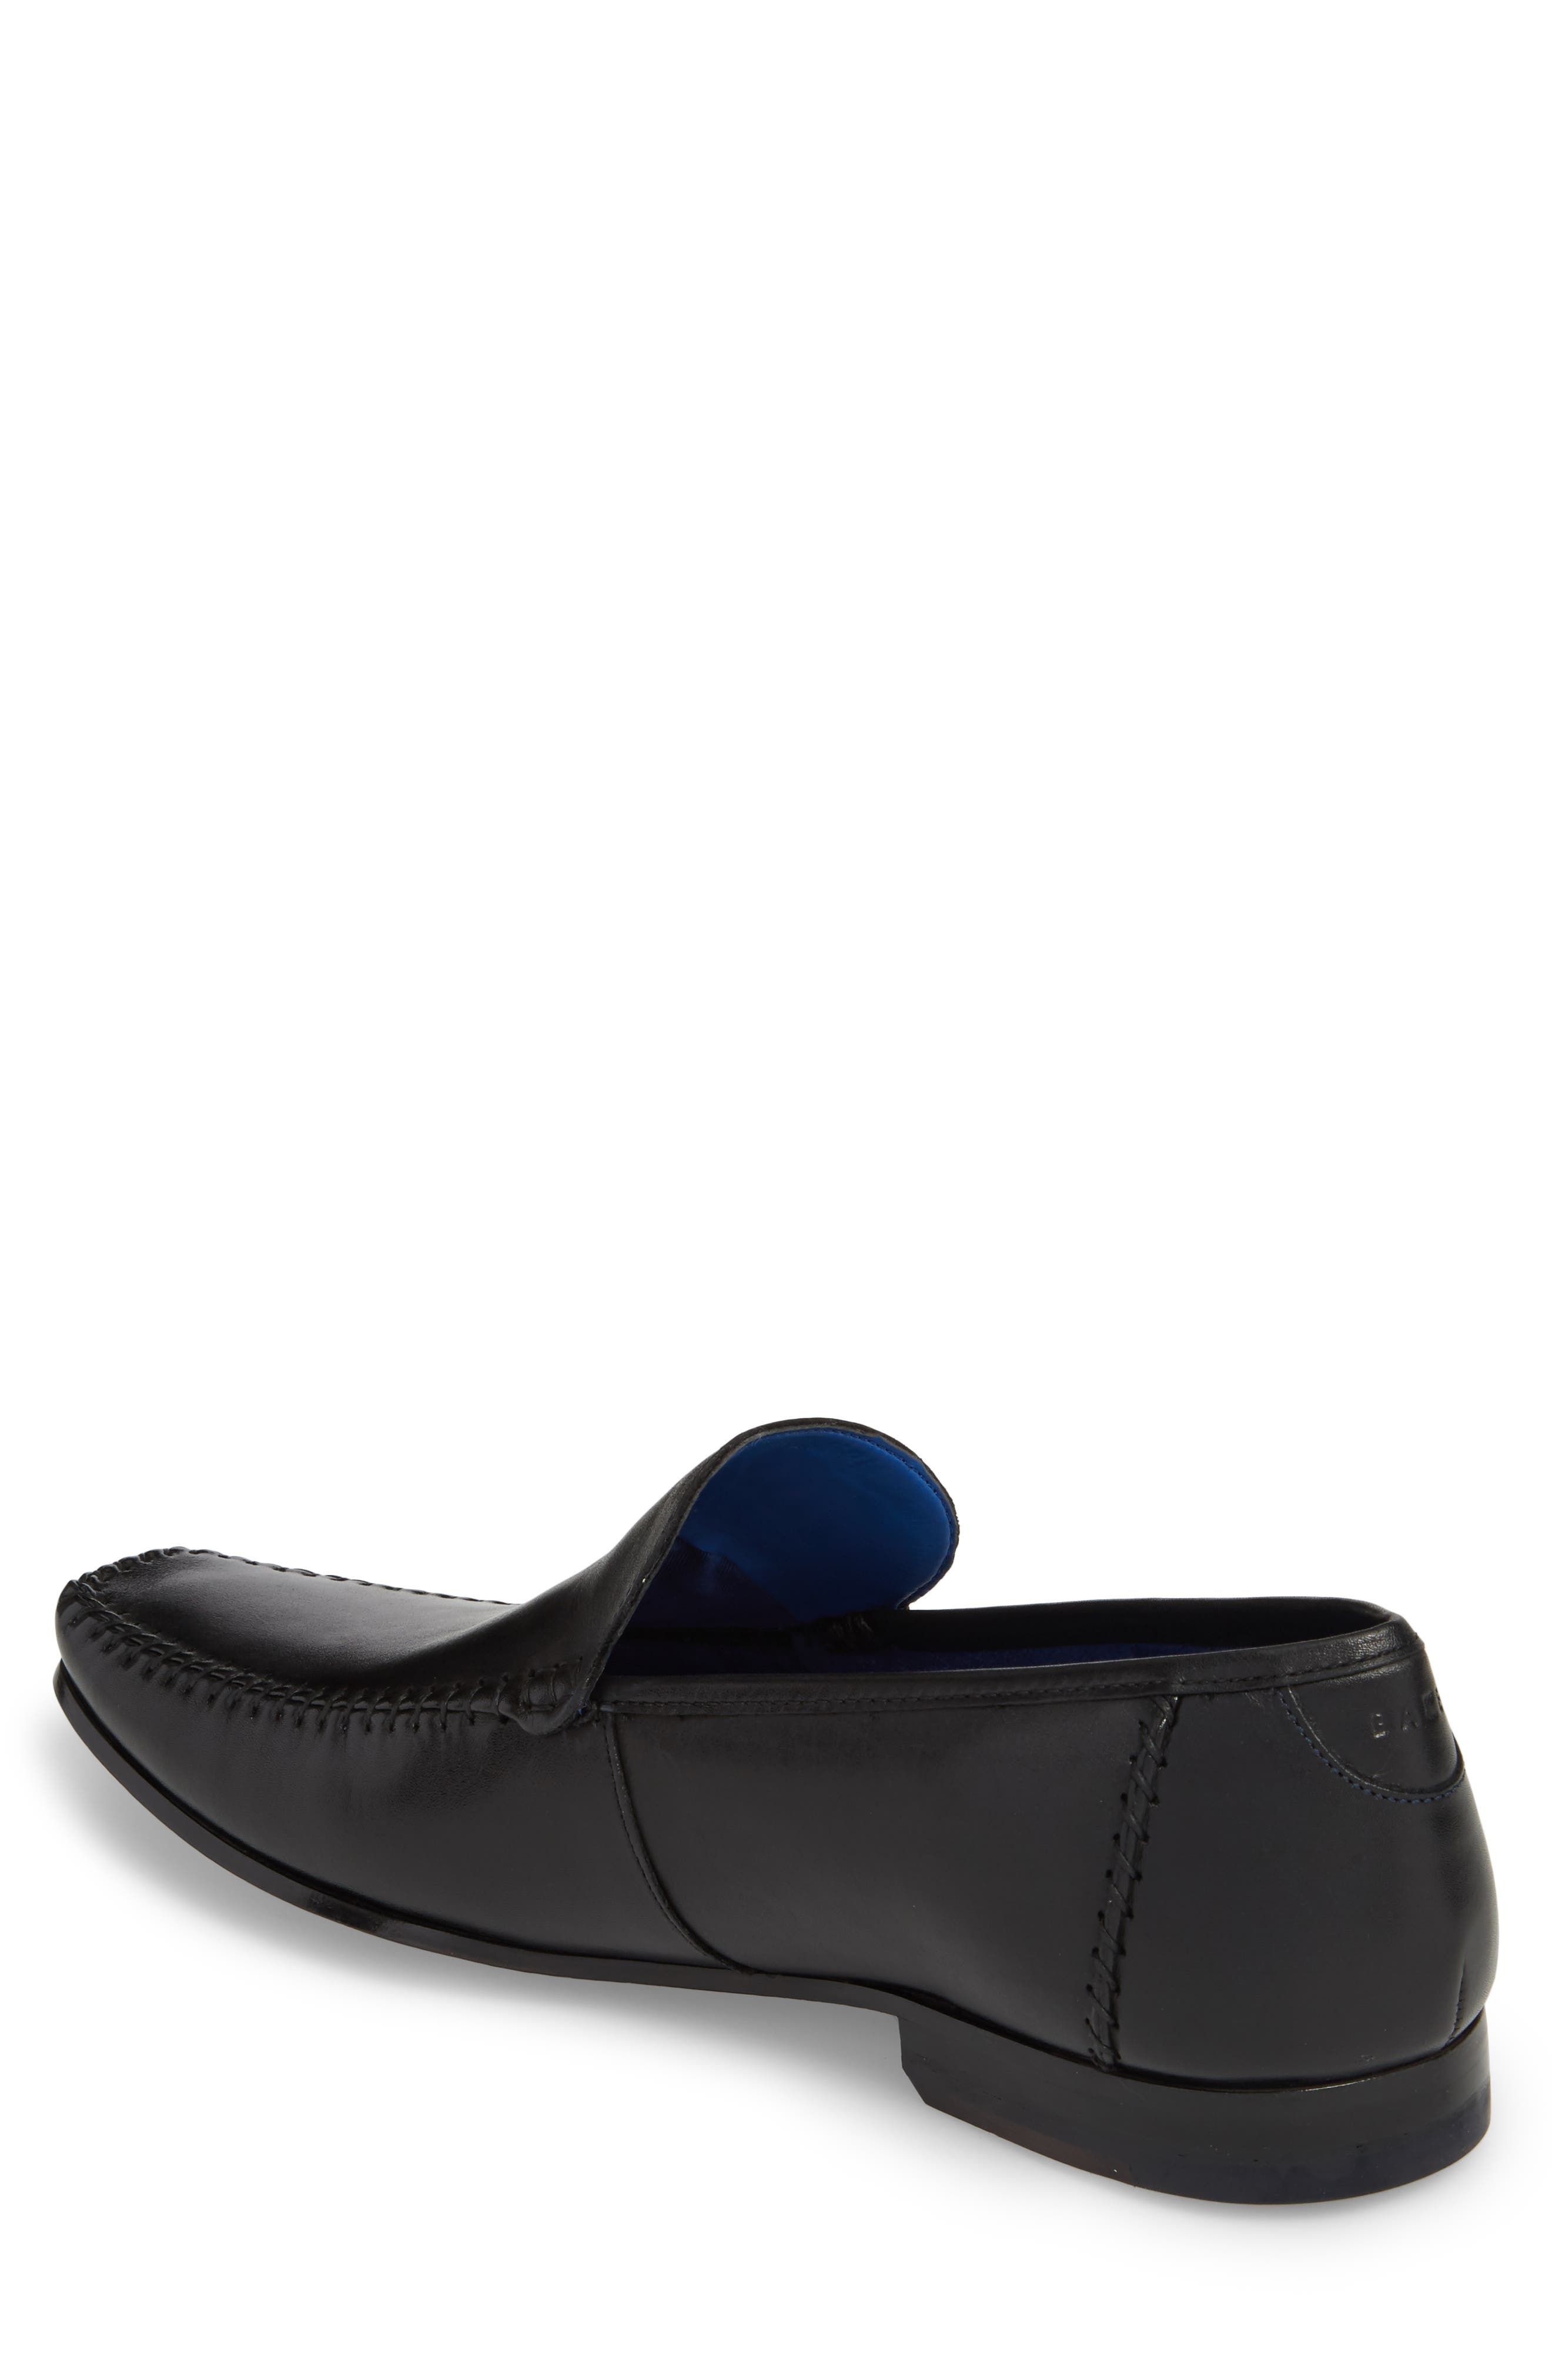 Bly 9 Venetian Loafer,                             Alternate thumbnail 2, color,                             Black Leather